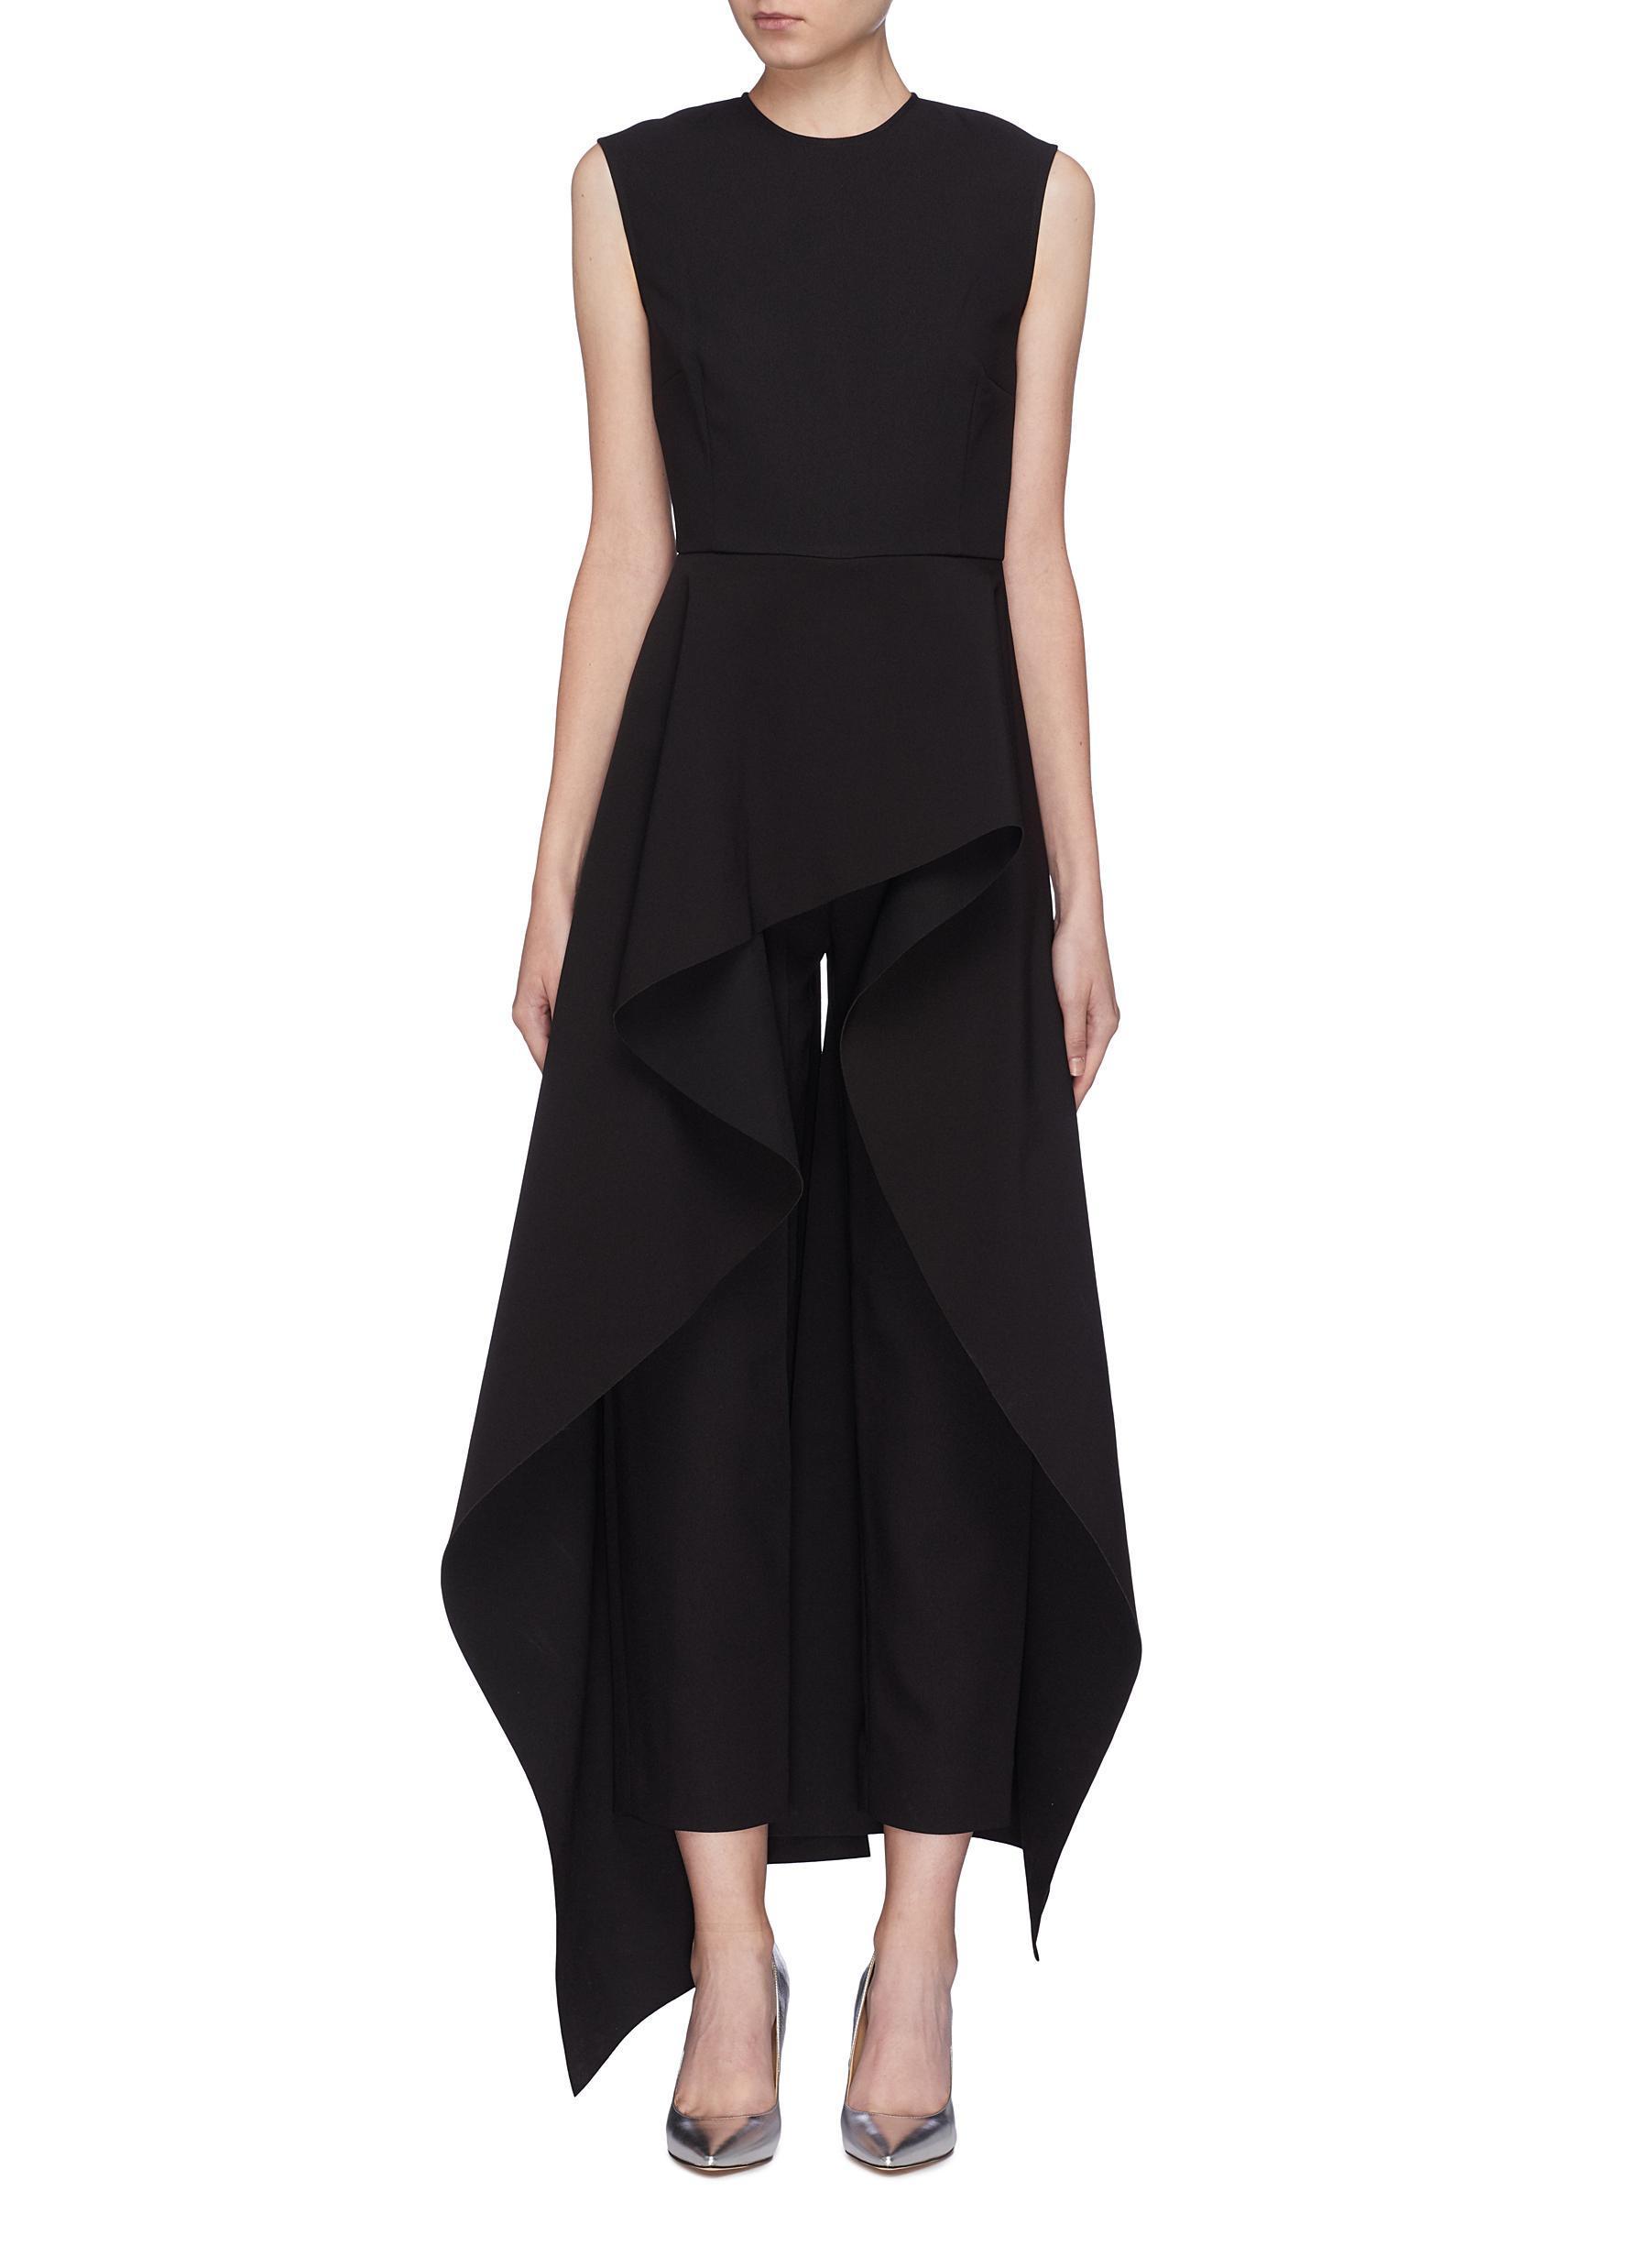 b9b4f11af7d Solace London Soraya Jumpsuit Black in Black - Lyst